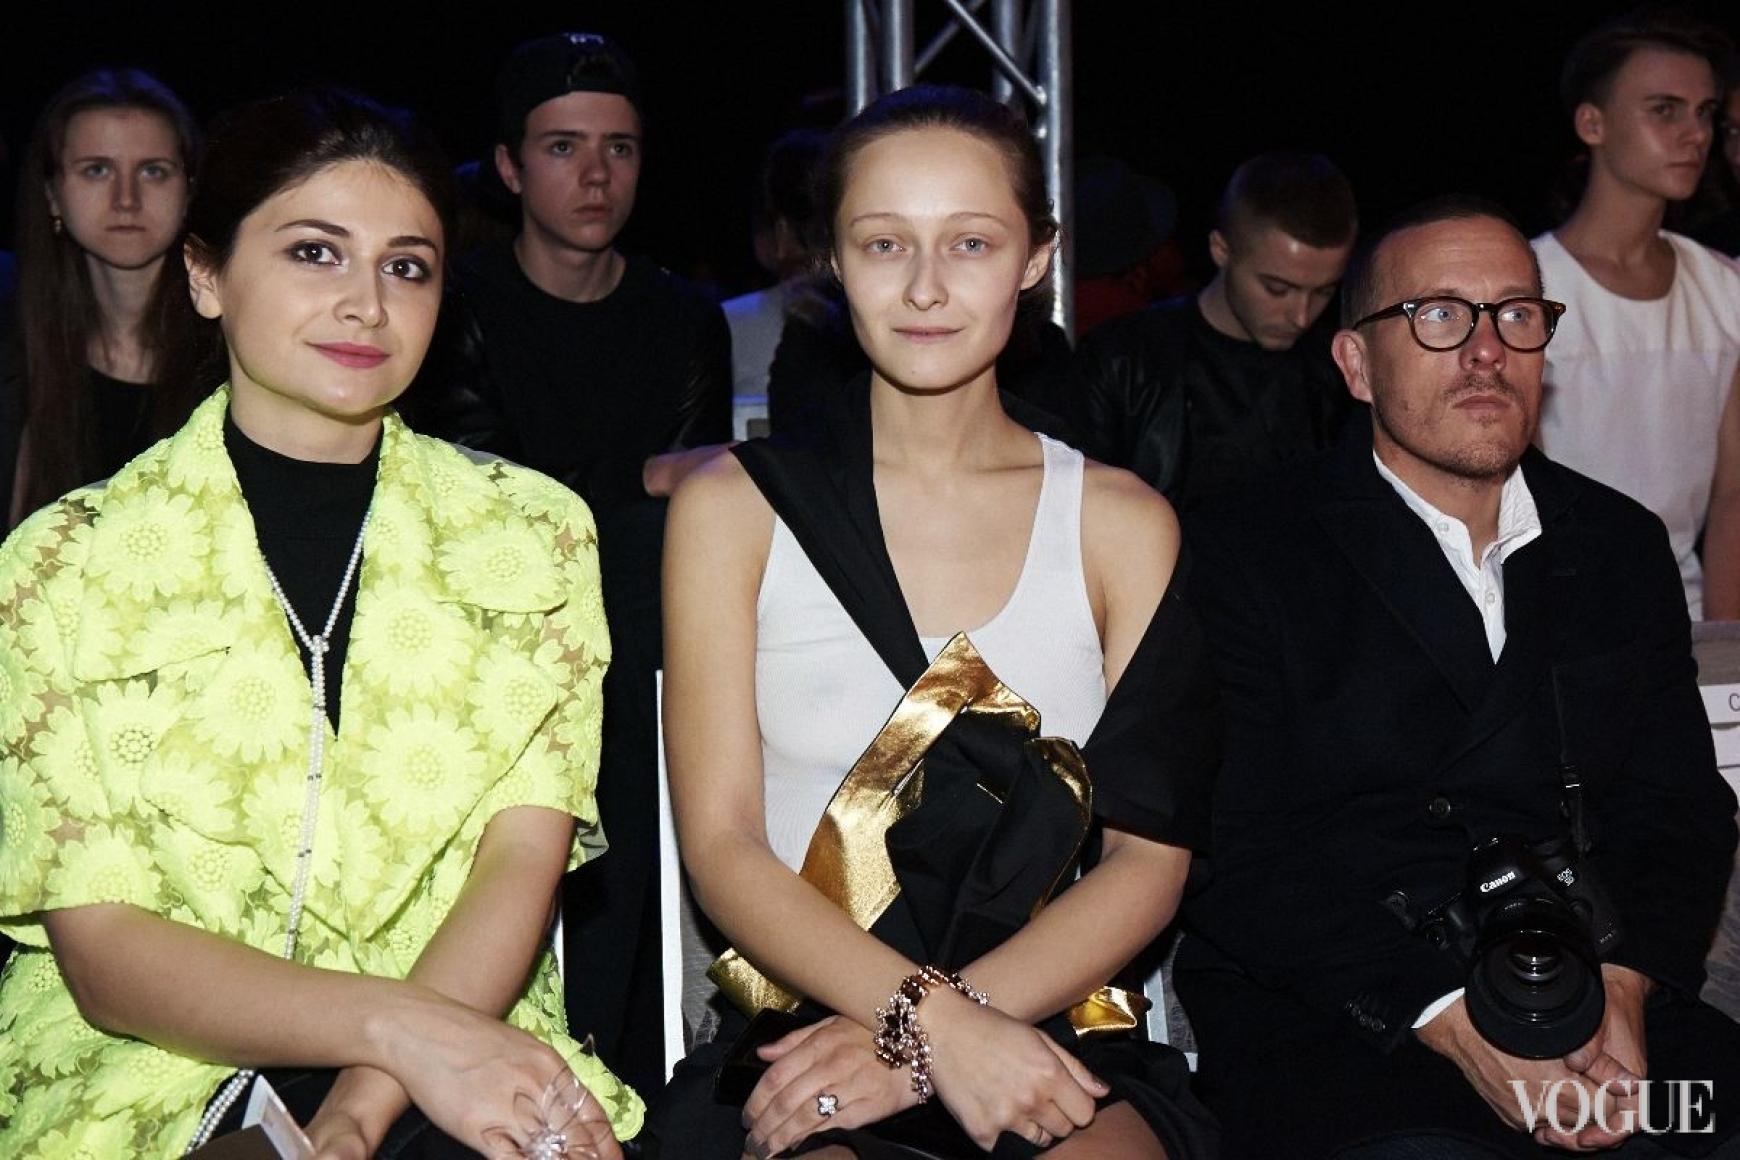 Нина Васадзе, Дарья Шаповалова и Скотт Шуман